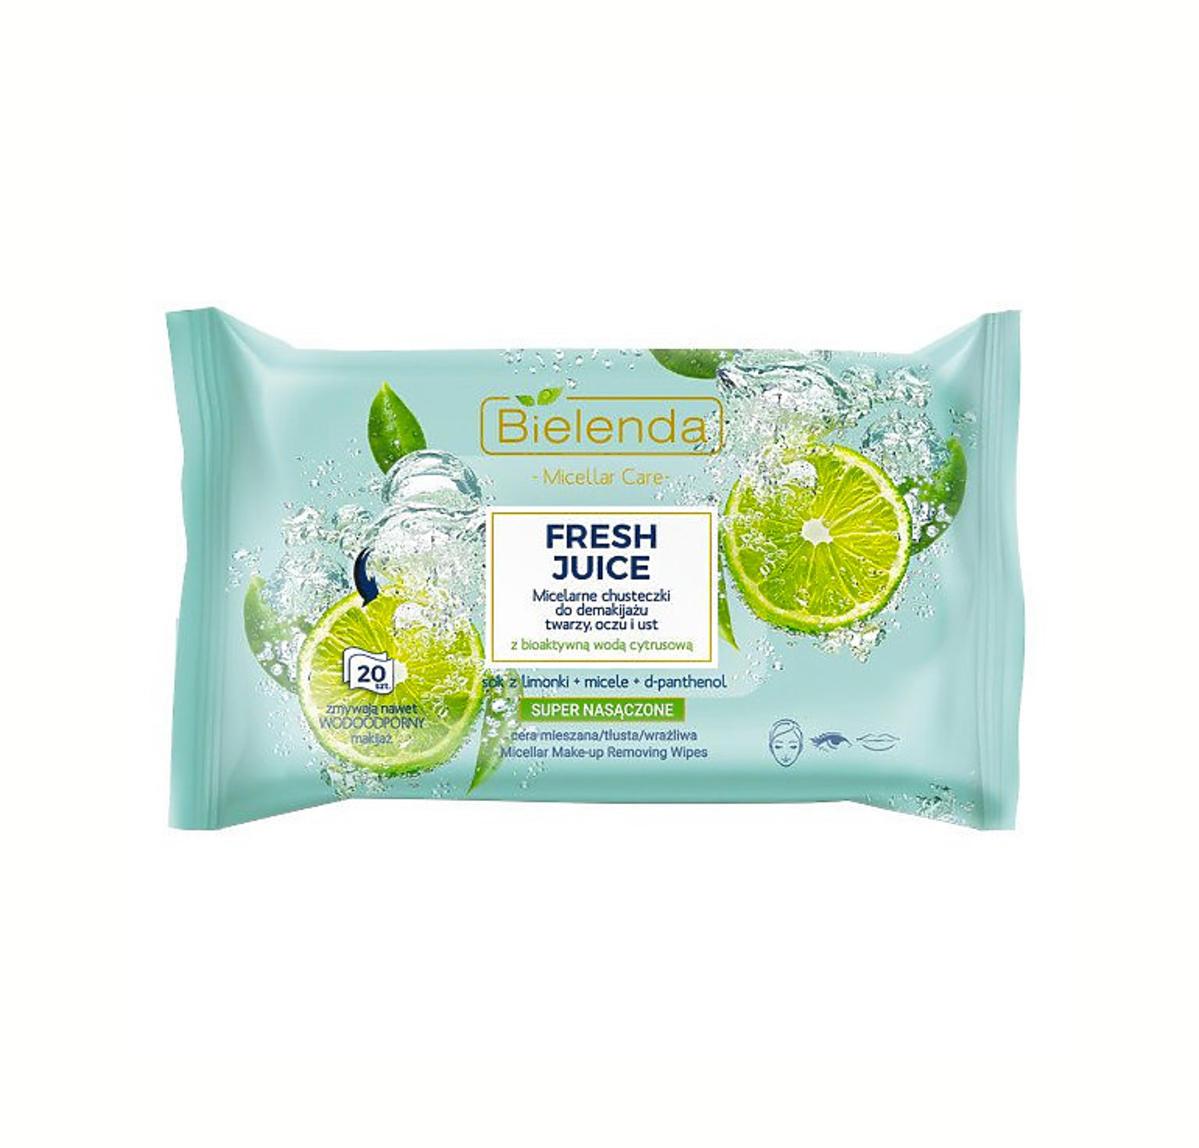 Fresh Juice od Bielendy, 10,99 zł za 20 sztuk